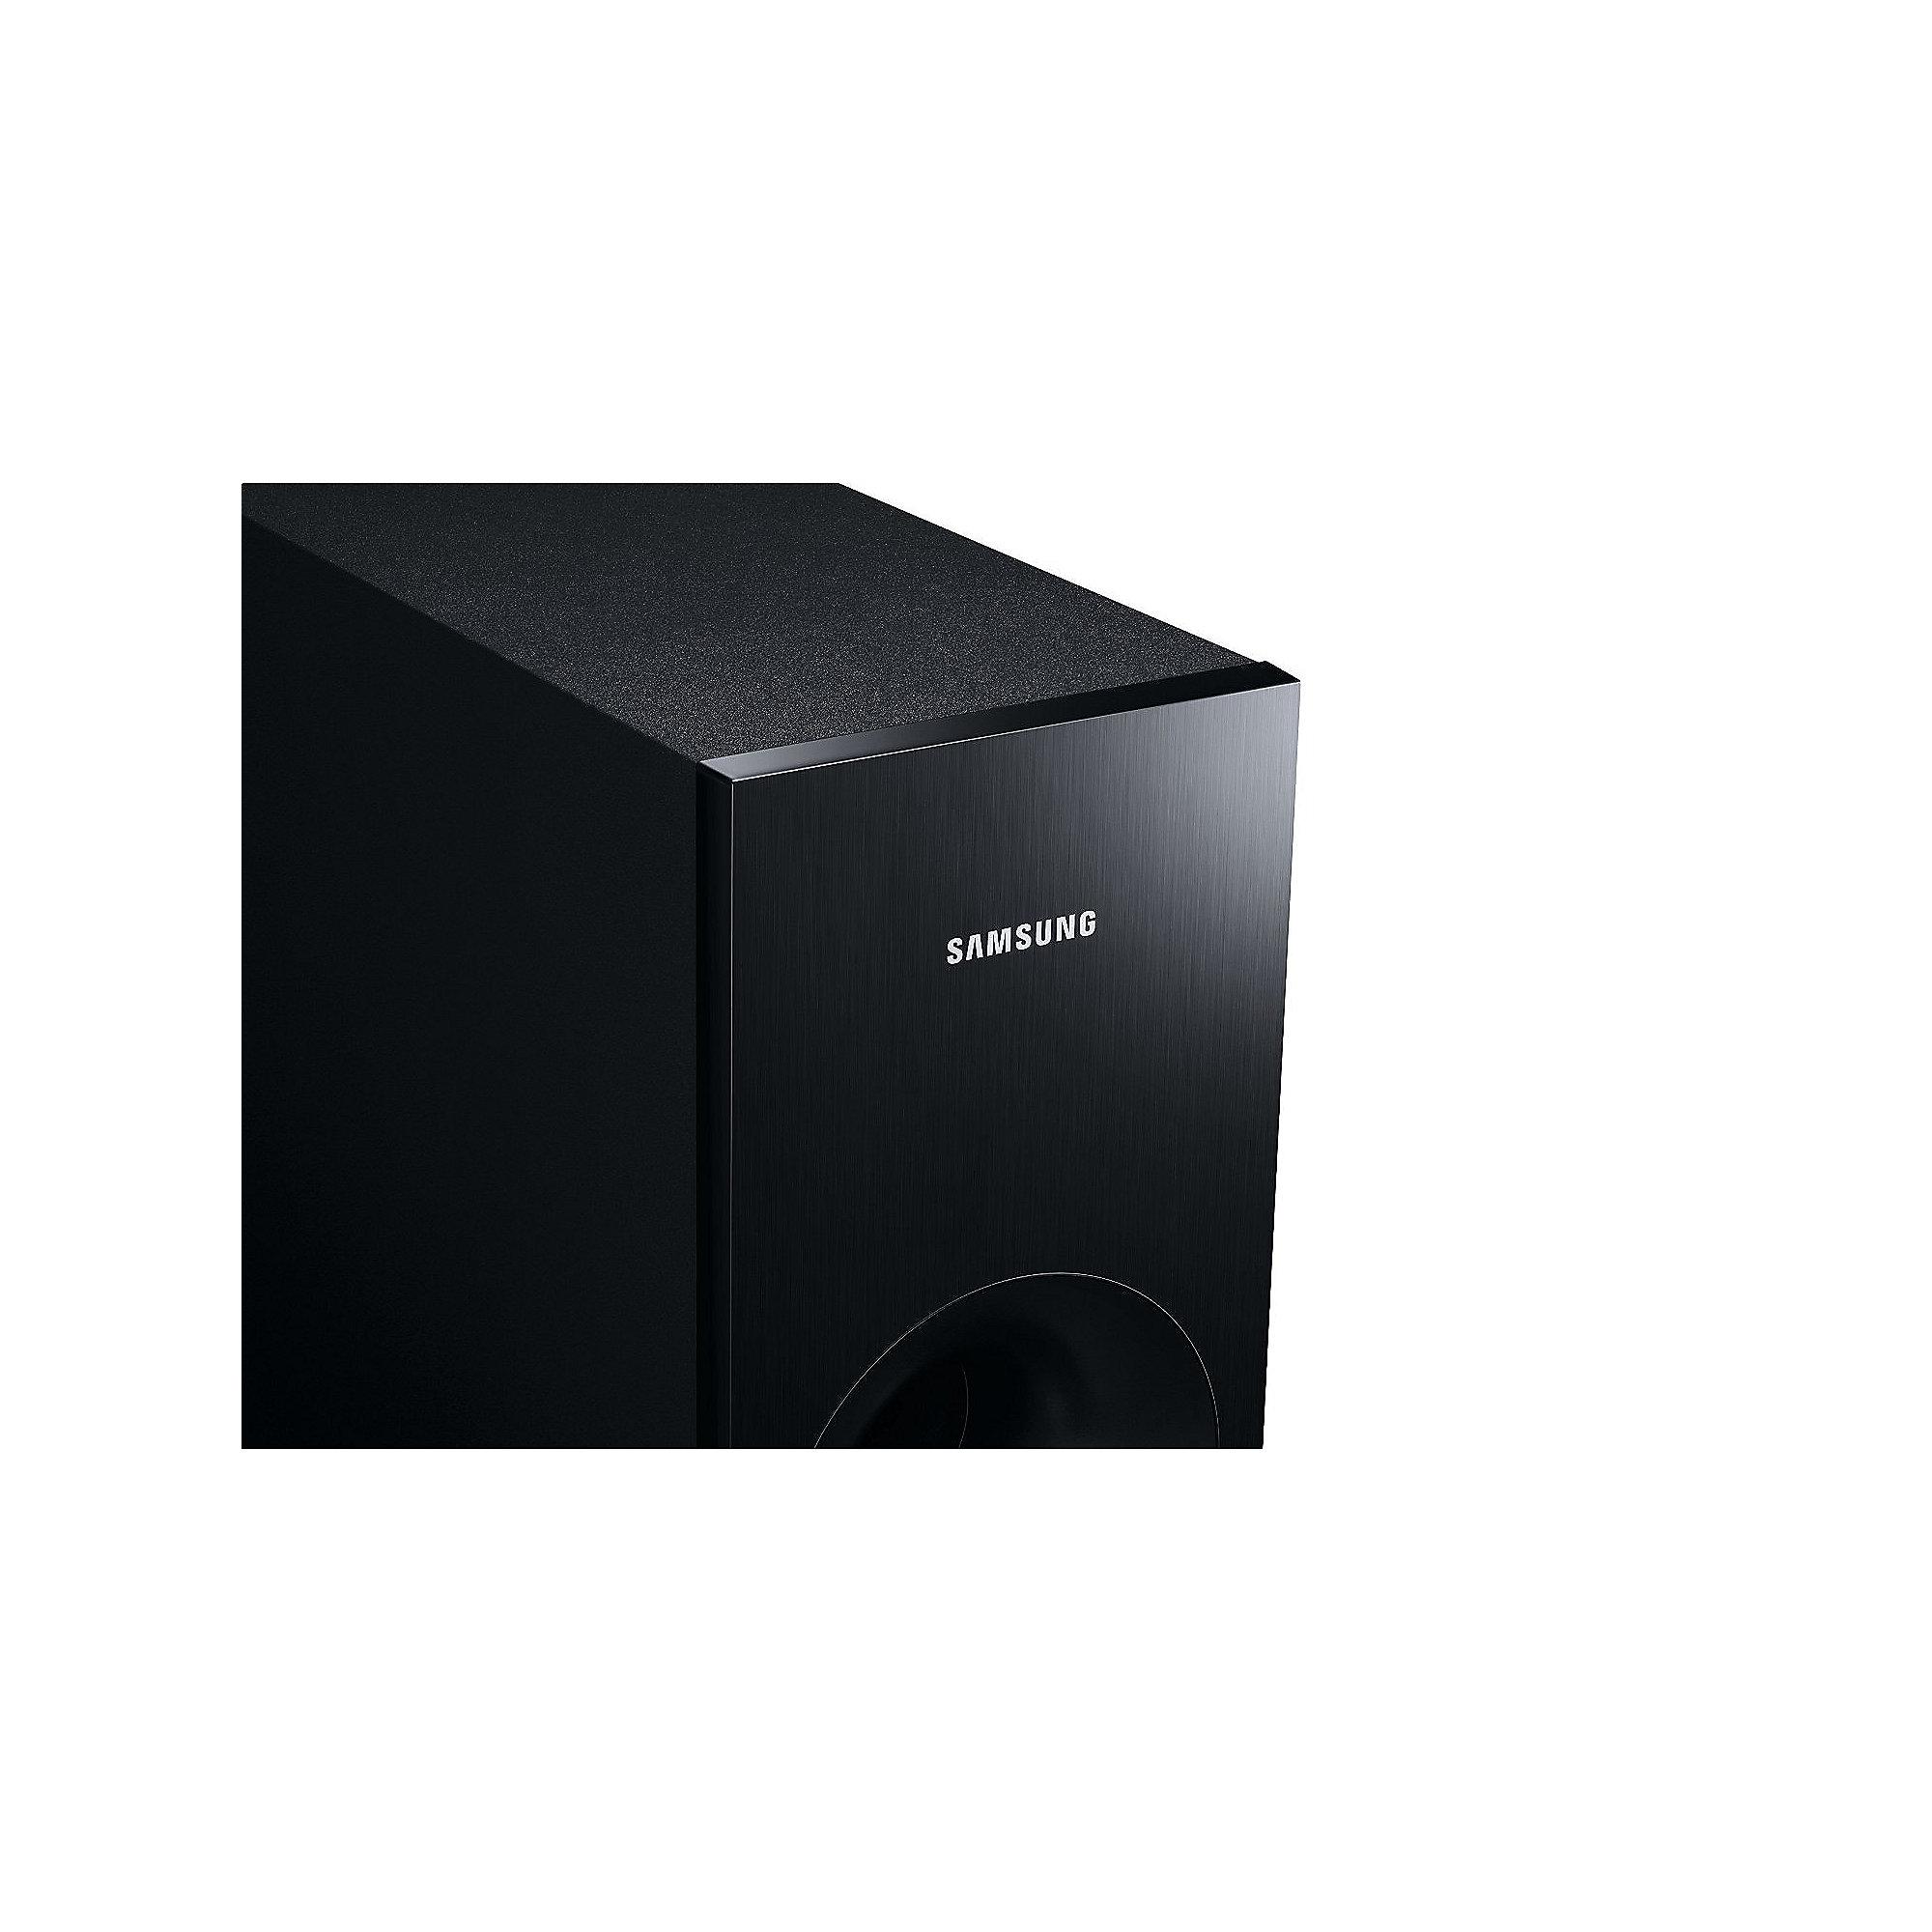 samsung ht j4500 5 1 3d blu ray heimkino system schwarz bluetooth lan cyberport. Black Bedroom Furniture Sets. Home Design Ideas